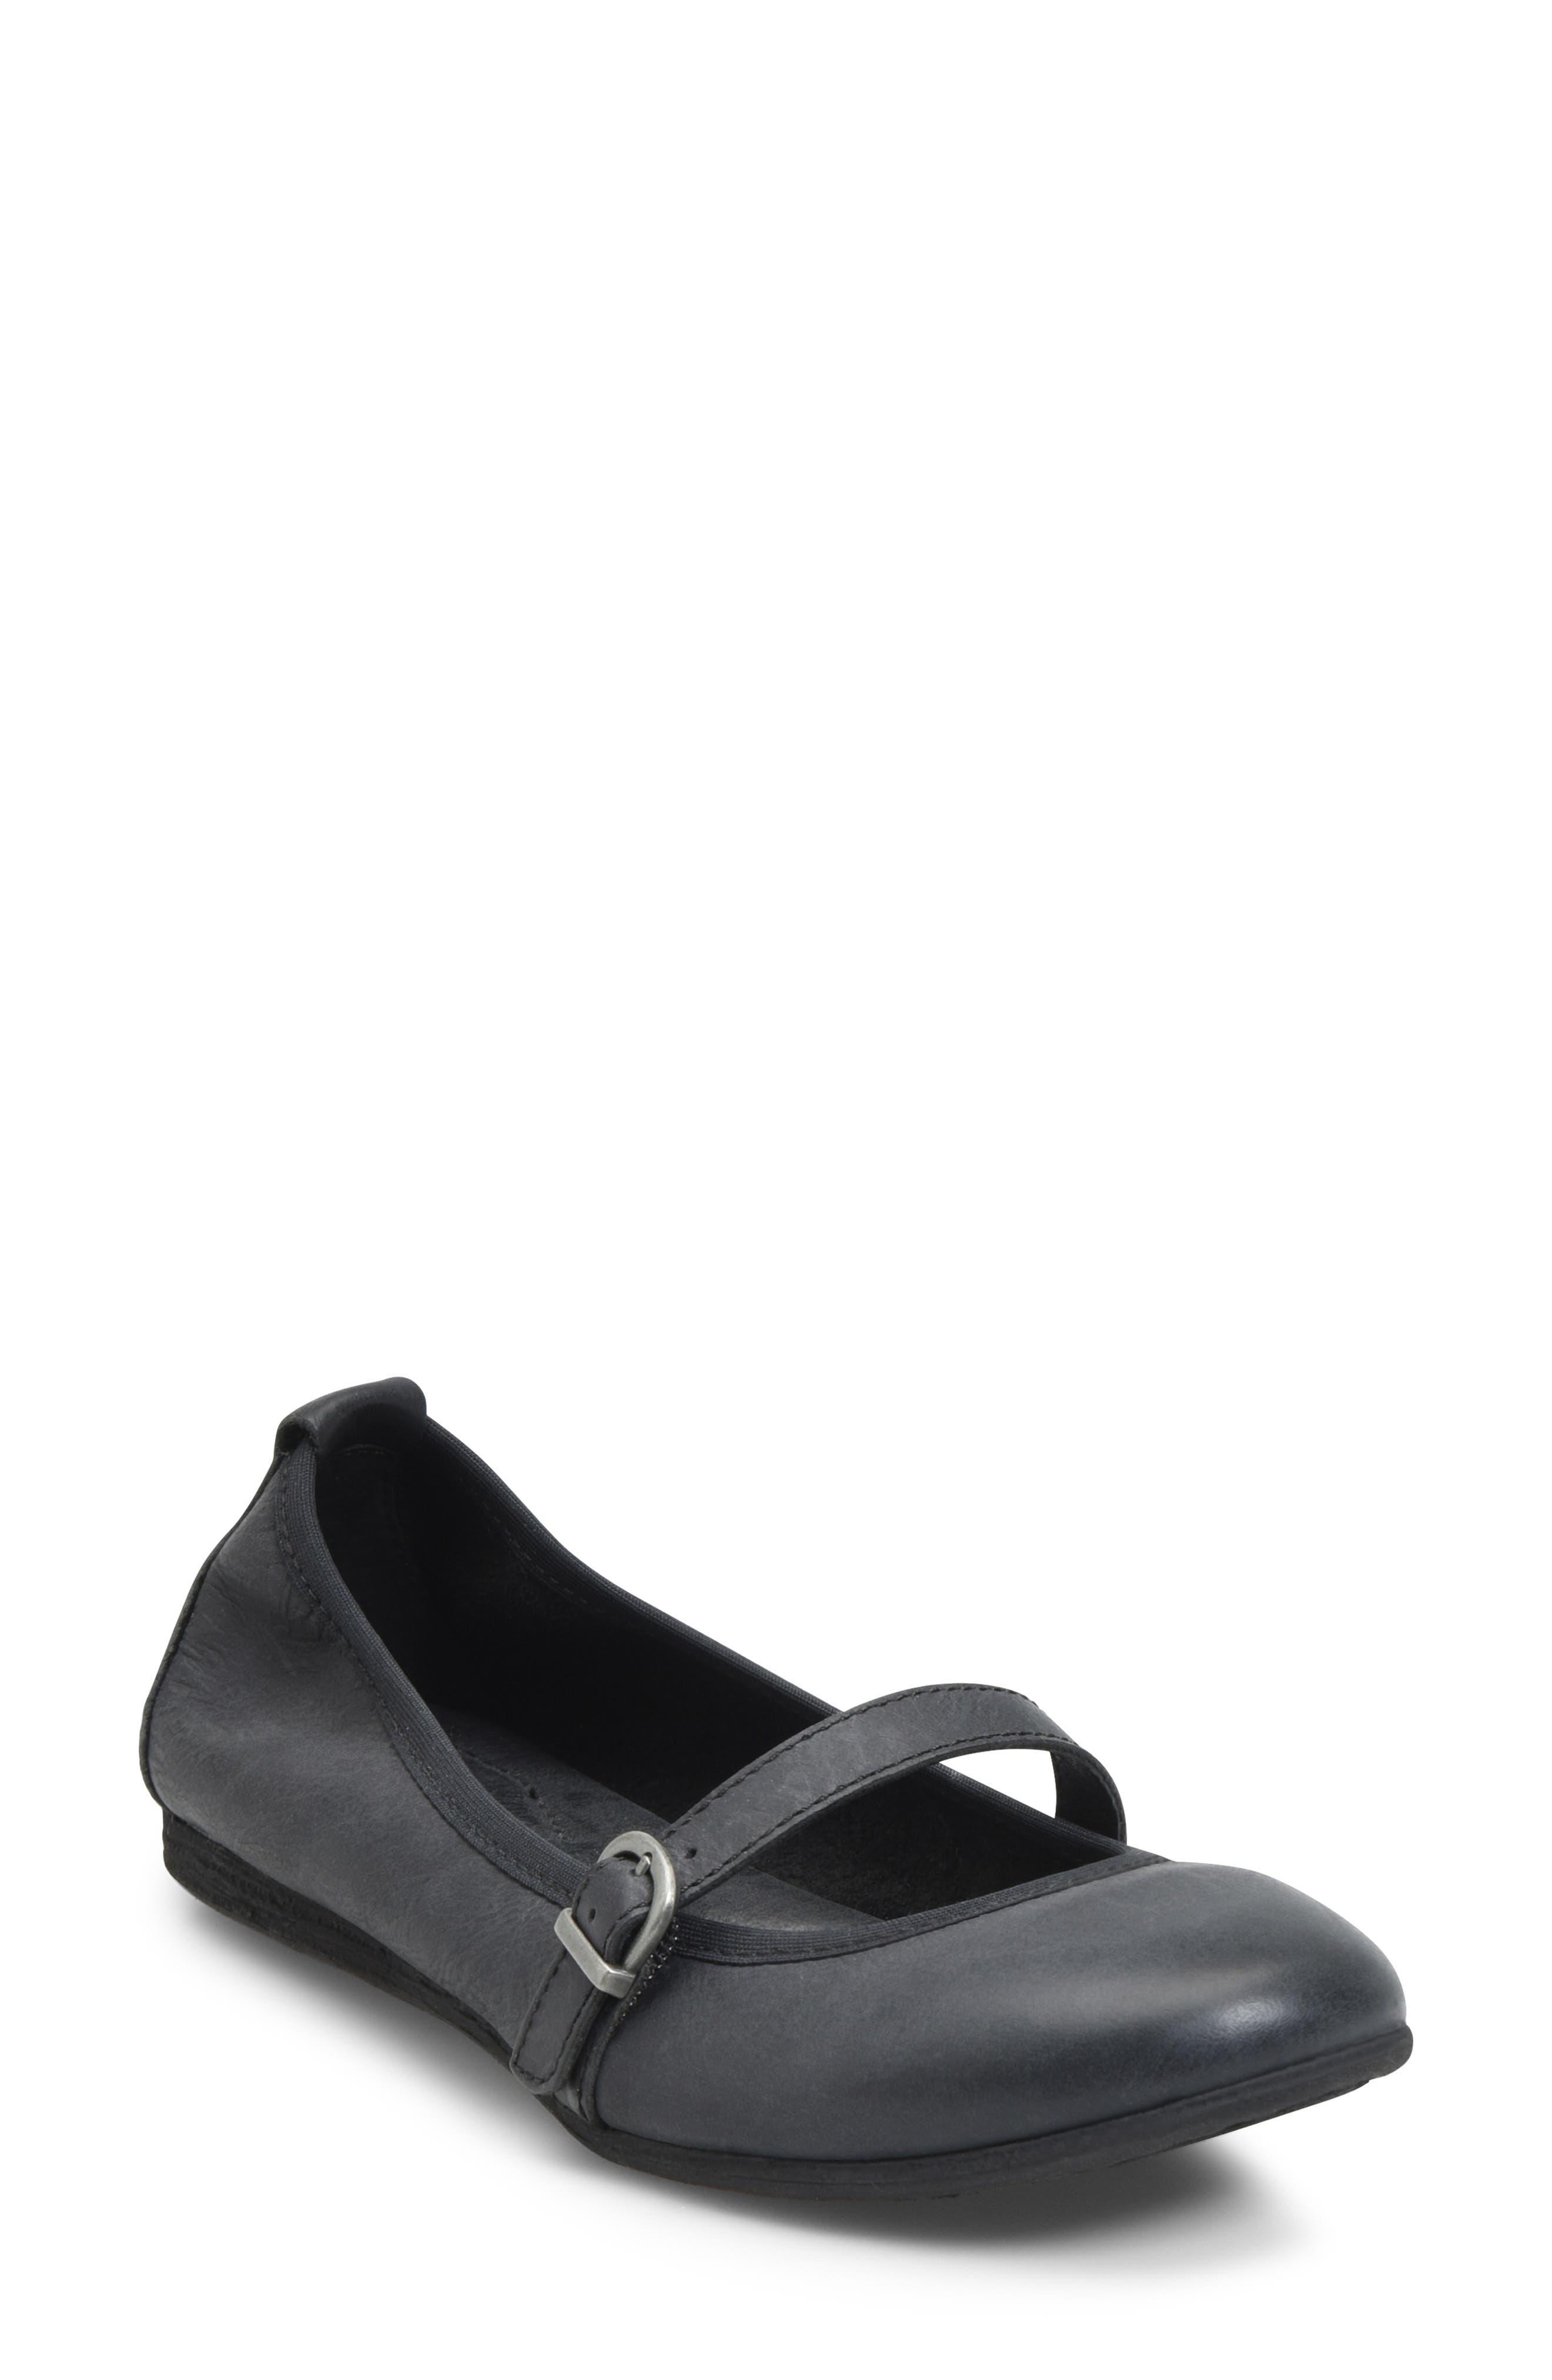 B?rn Curlew Mary Jane Ballet Flat, Black